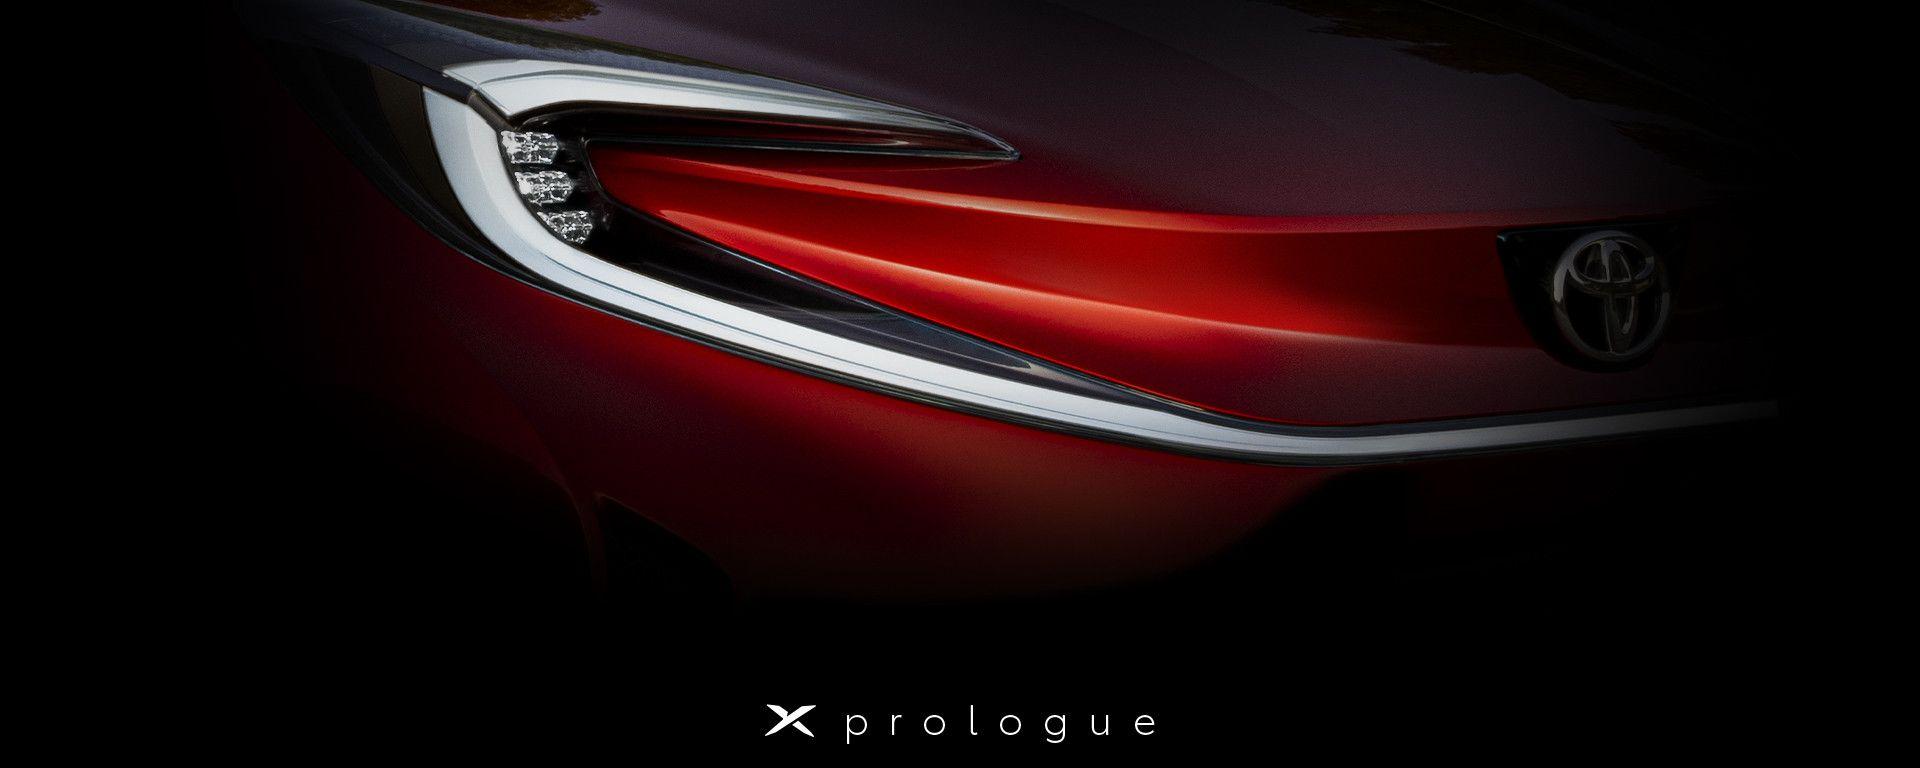 Toyota X prologue, un giro di parole per nuova Toyota Aygo?